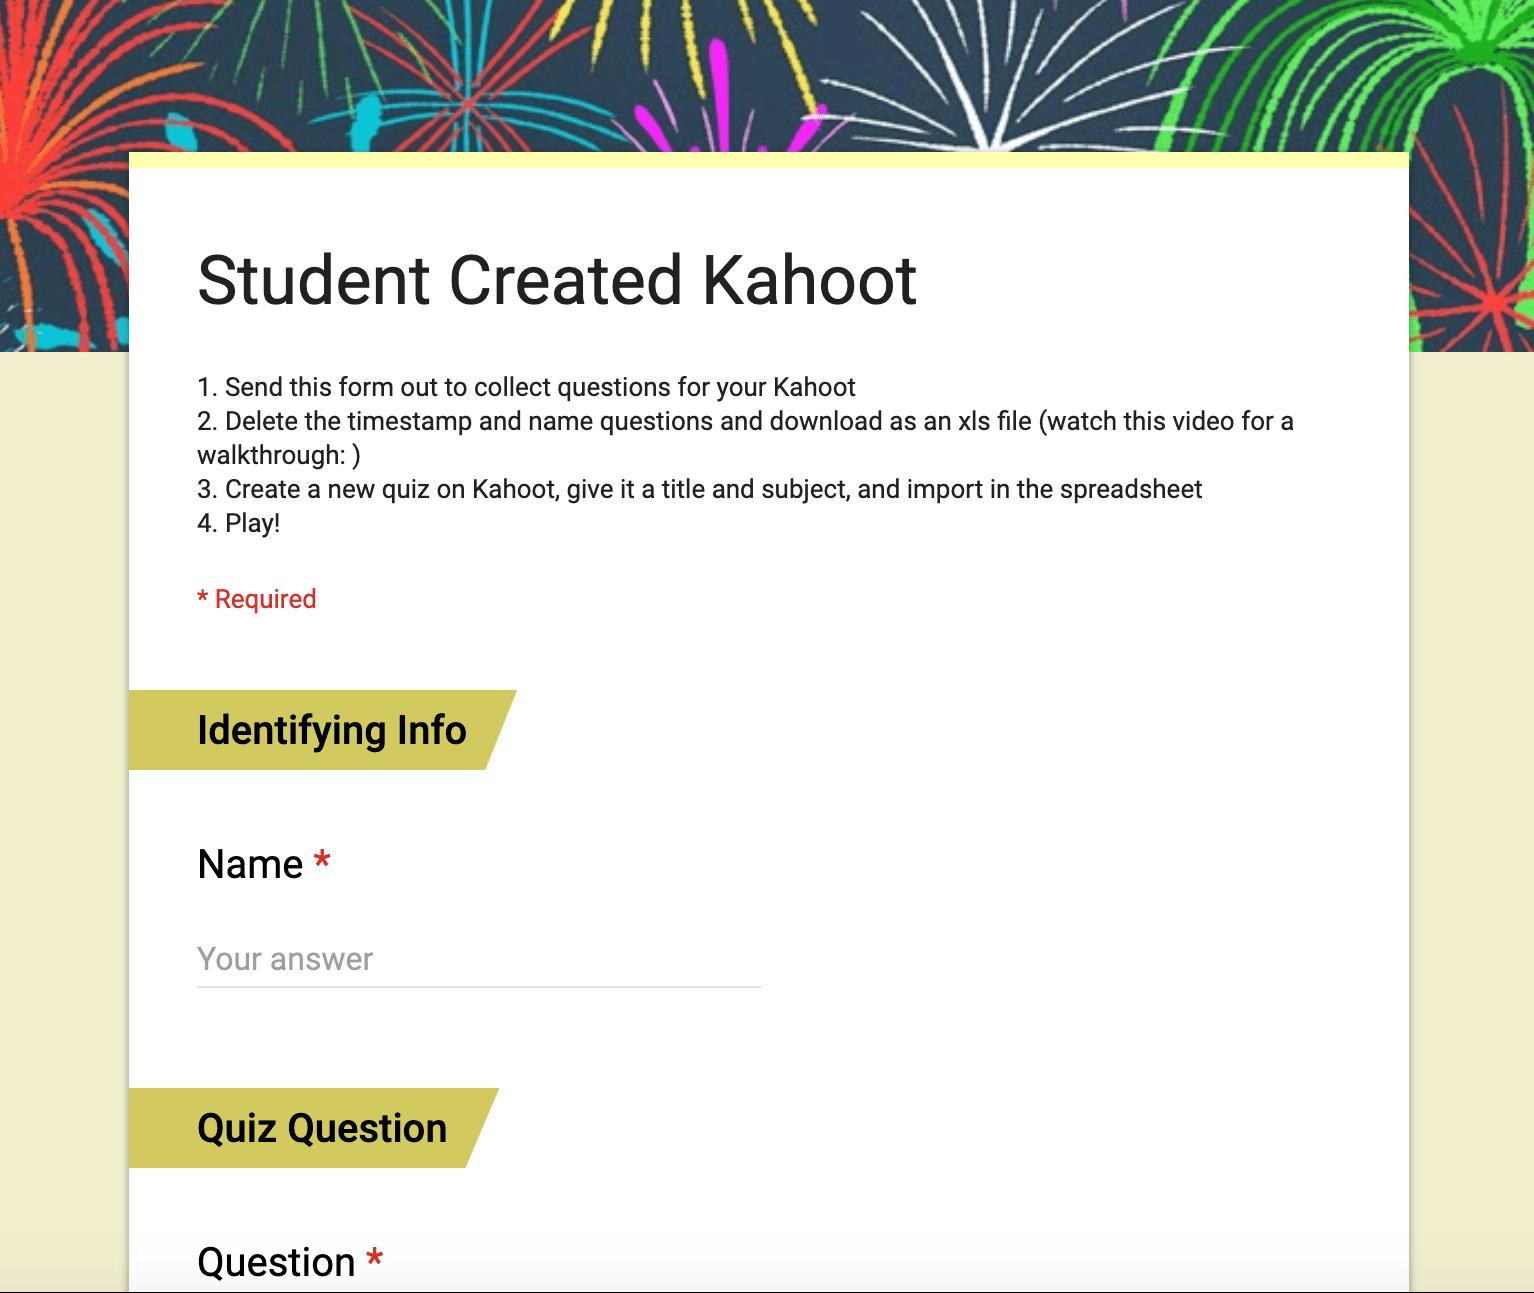 Student Created Kahoot Google Form